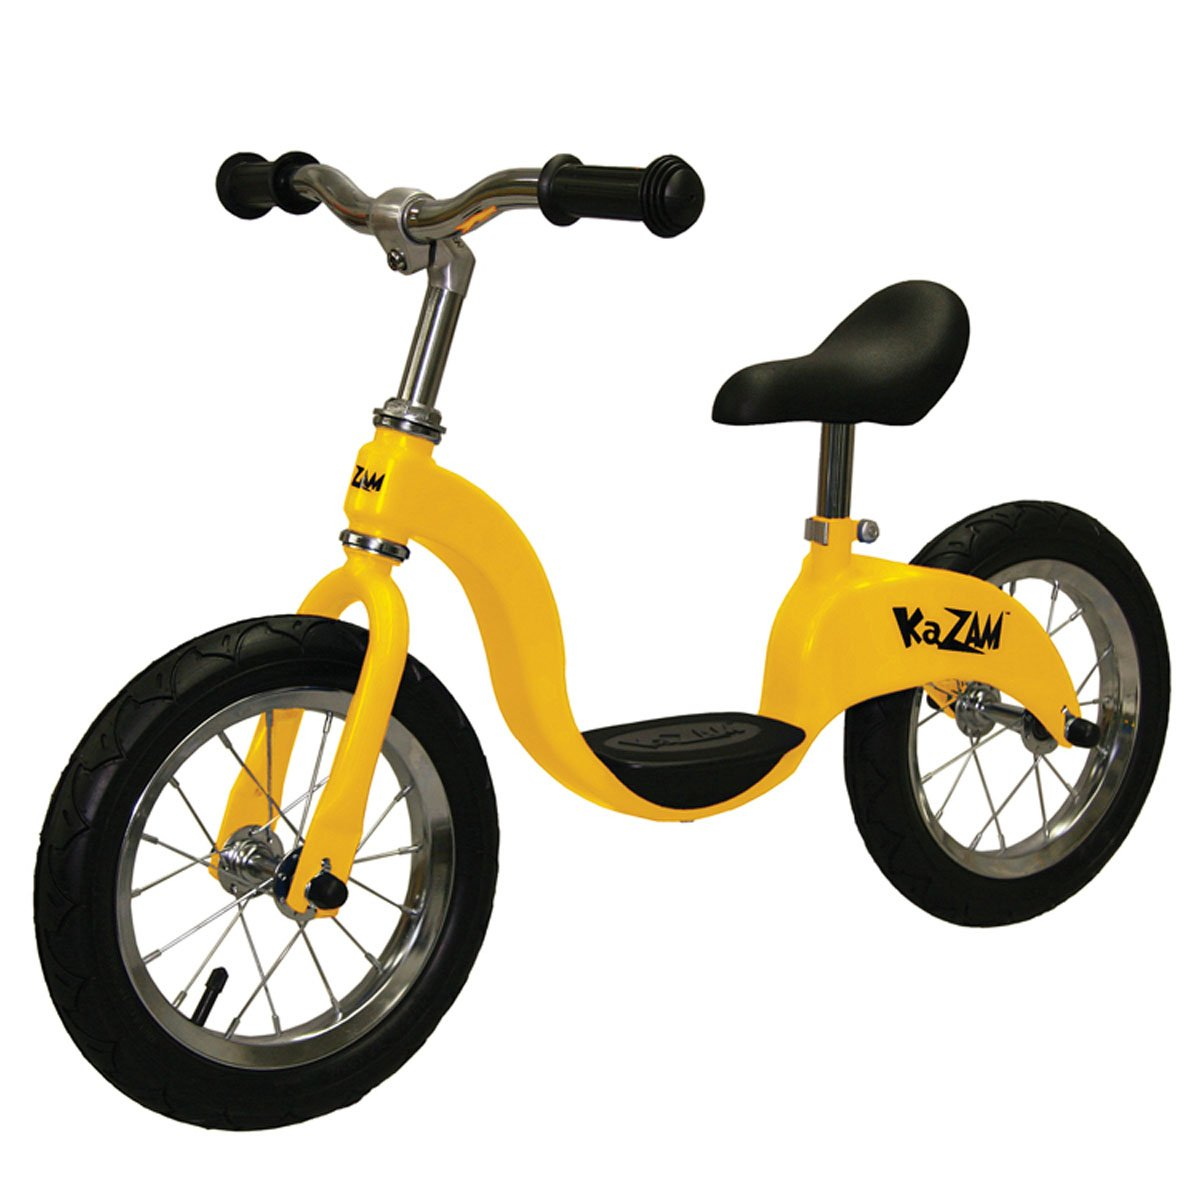 kazam-classic-balance-bike